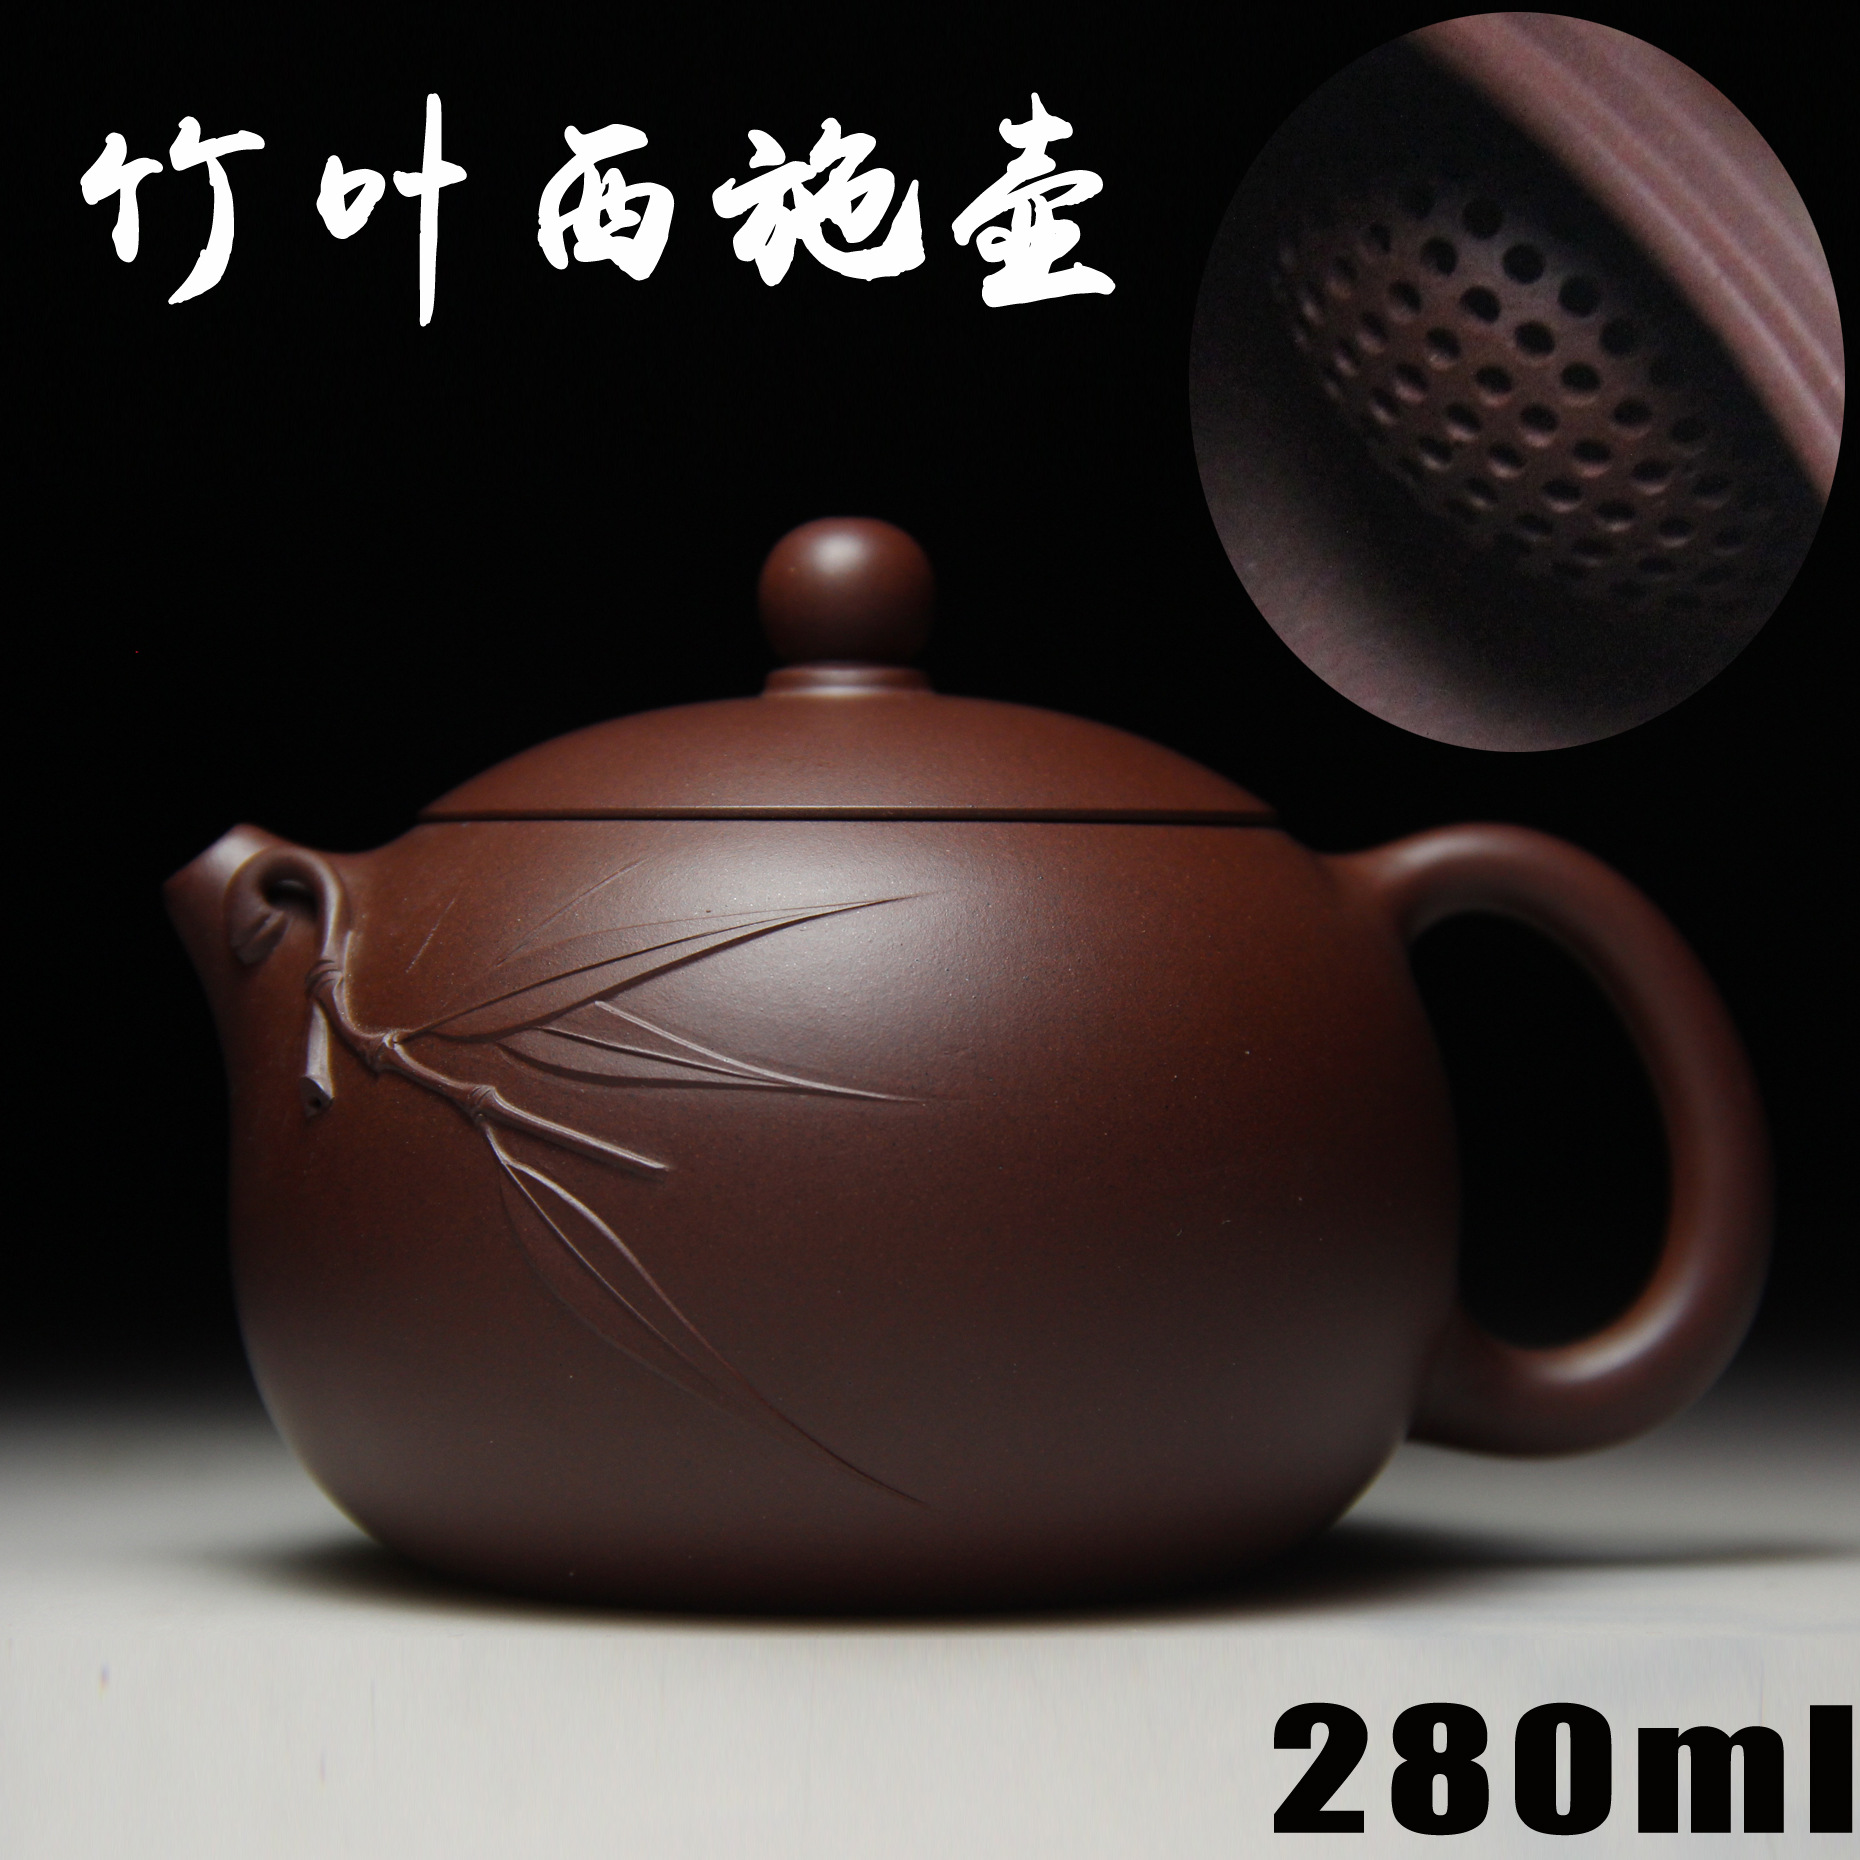 Authentic Yixing Zisha masters handmade teapot old bamboo beauty pot of purple clay ore wholesale and retail 436Authentic Yixing Zisha masters handmade teapot old bamboo beauty pot of purple clay ore wholesale and retail 436